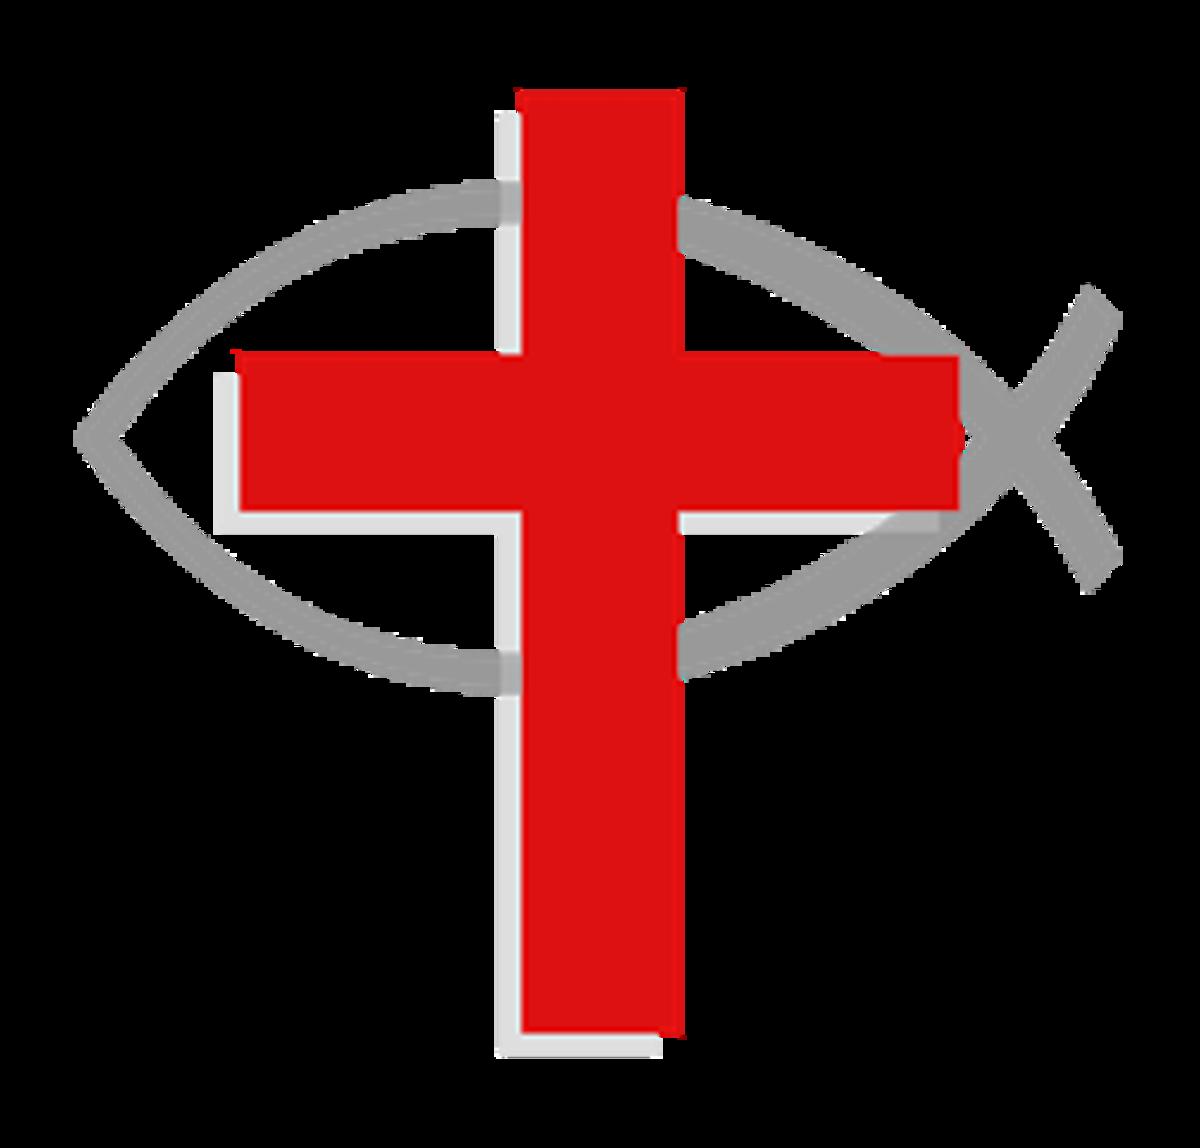 More traditionally a single Cross